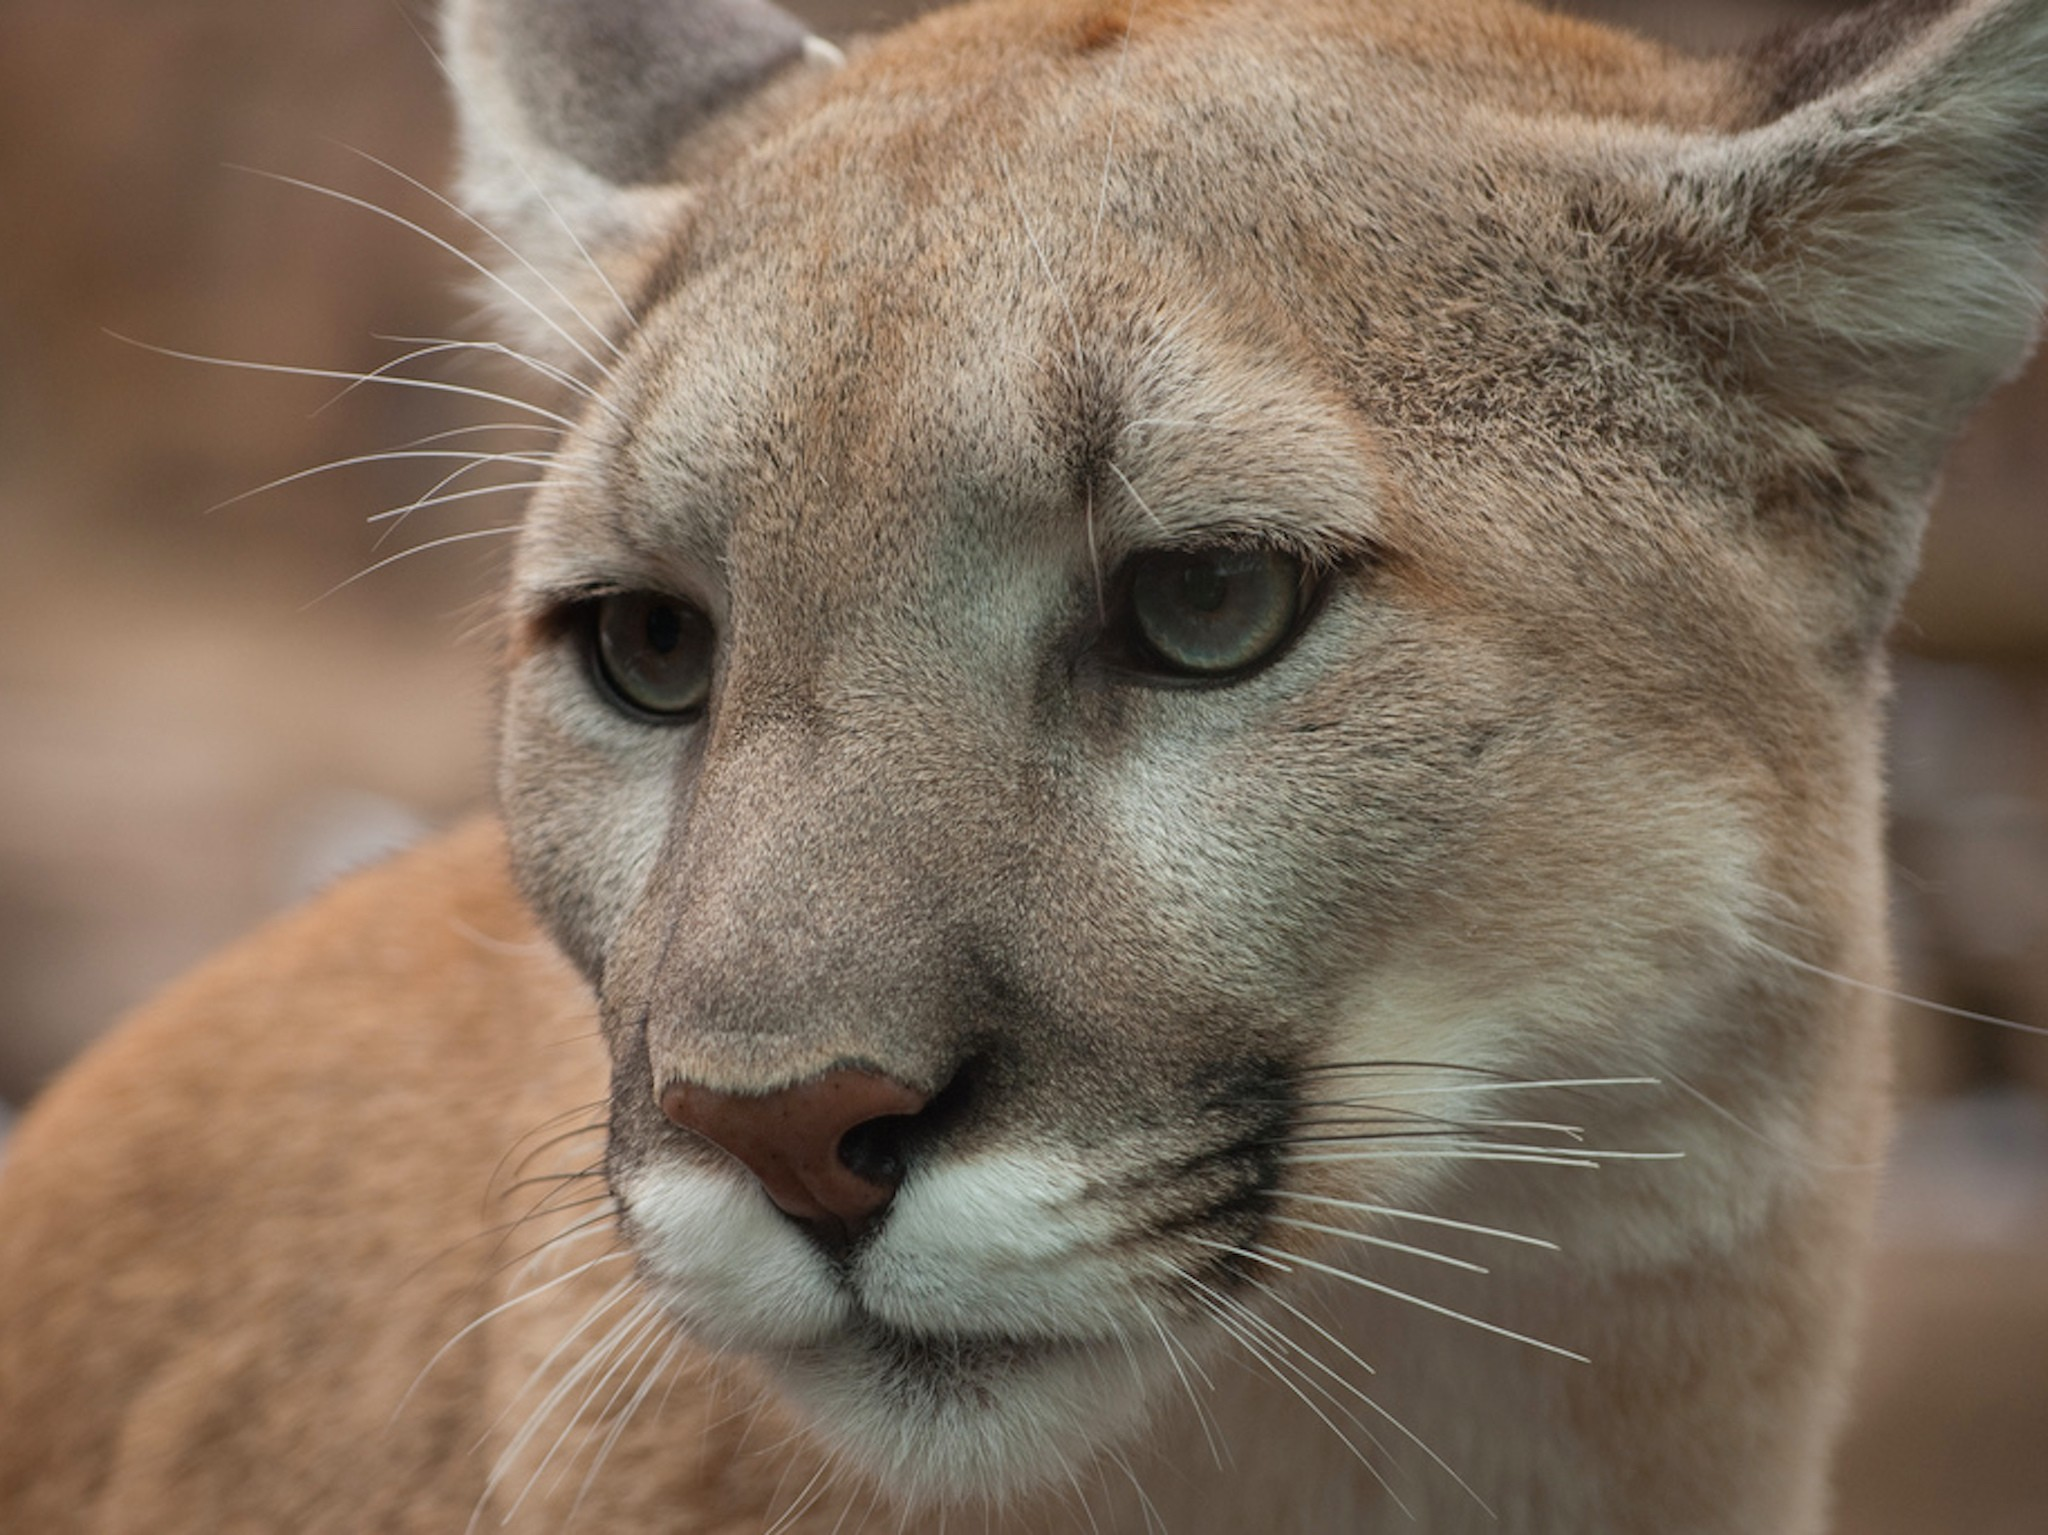 Cheetah Wallpaper Hd Handsome Puma Cat Wallpaper Free Hd Puma Image